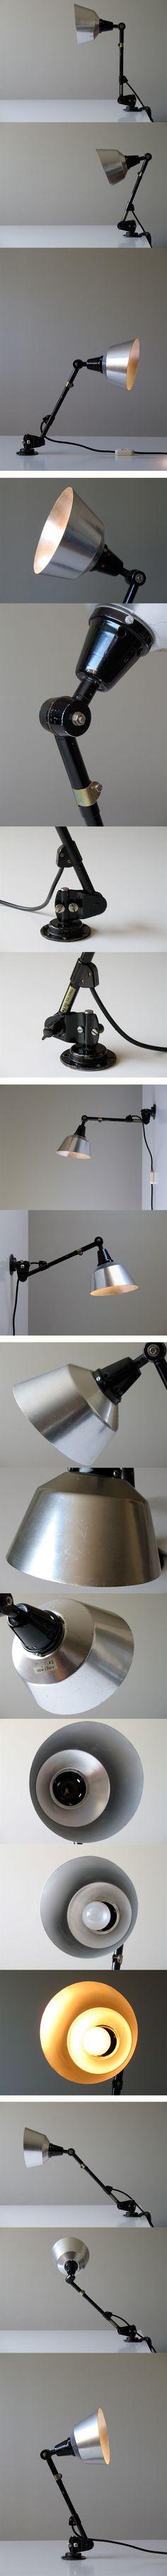 130 best bauhaus u lampe ,design images on pinterest | interiors